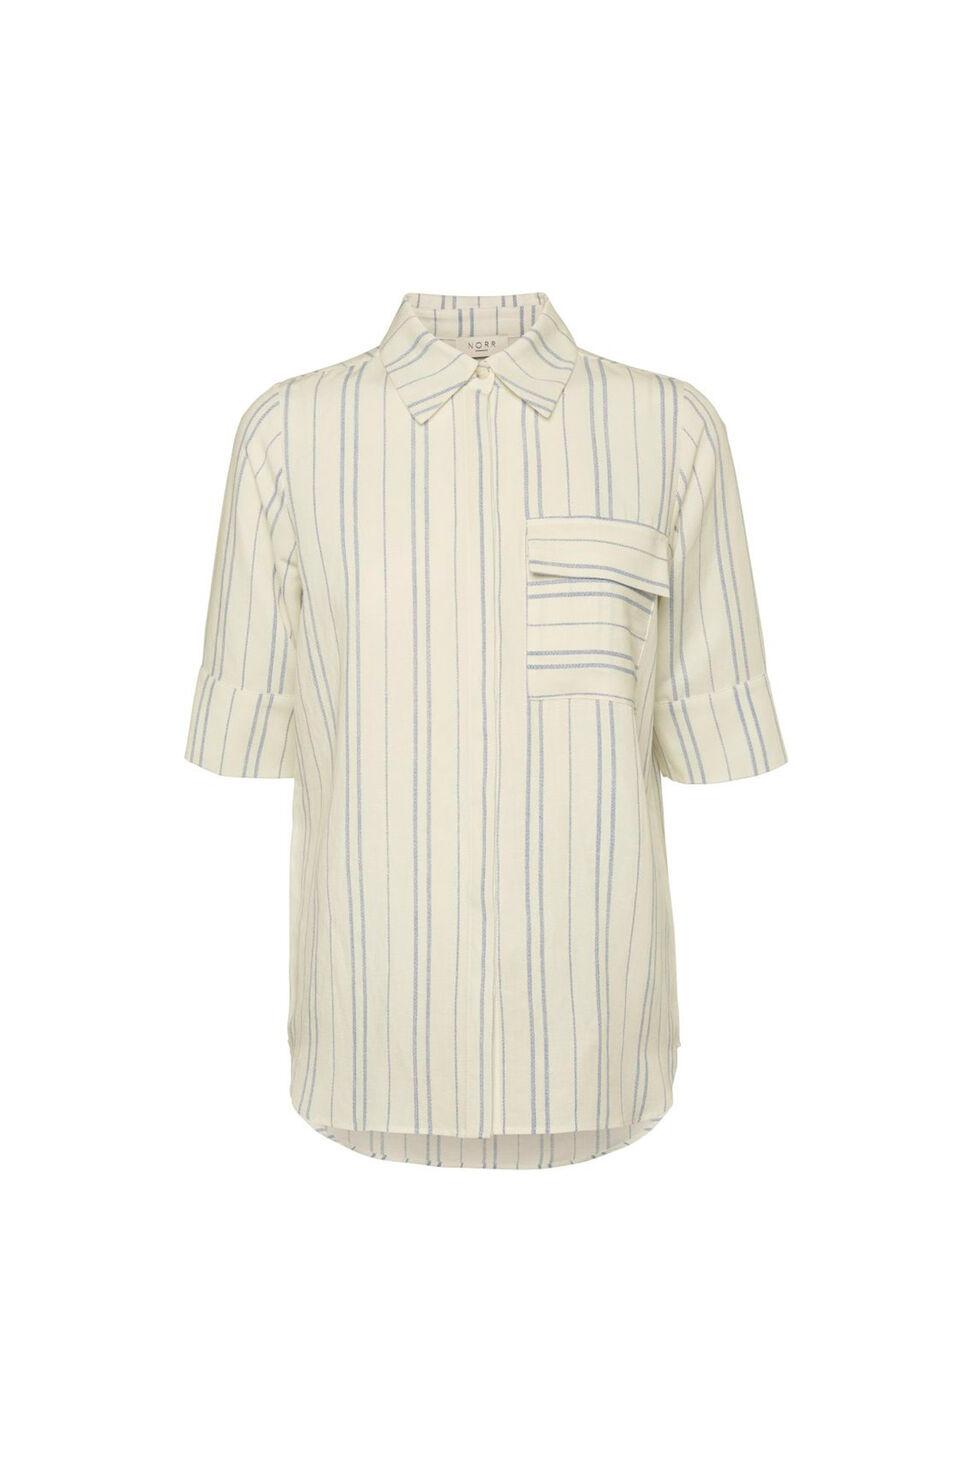 Silverly shirt 11861253, WHITE/BLUE STRIPE